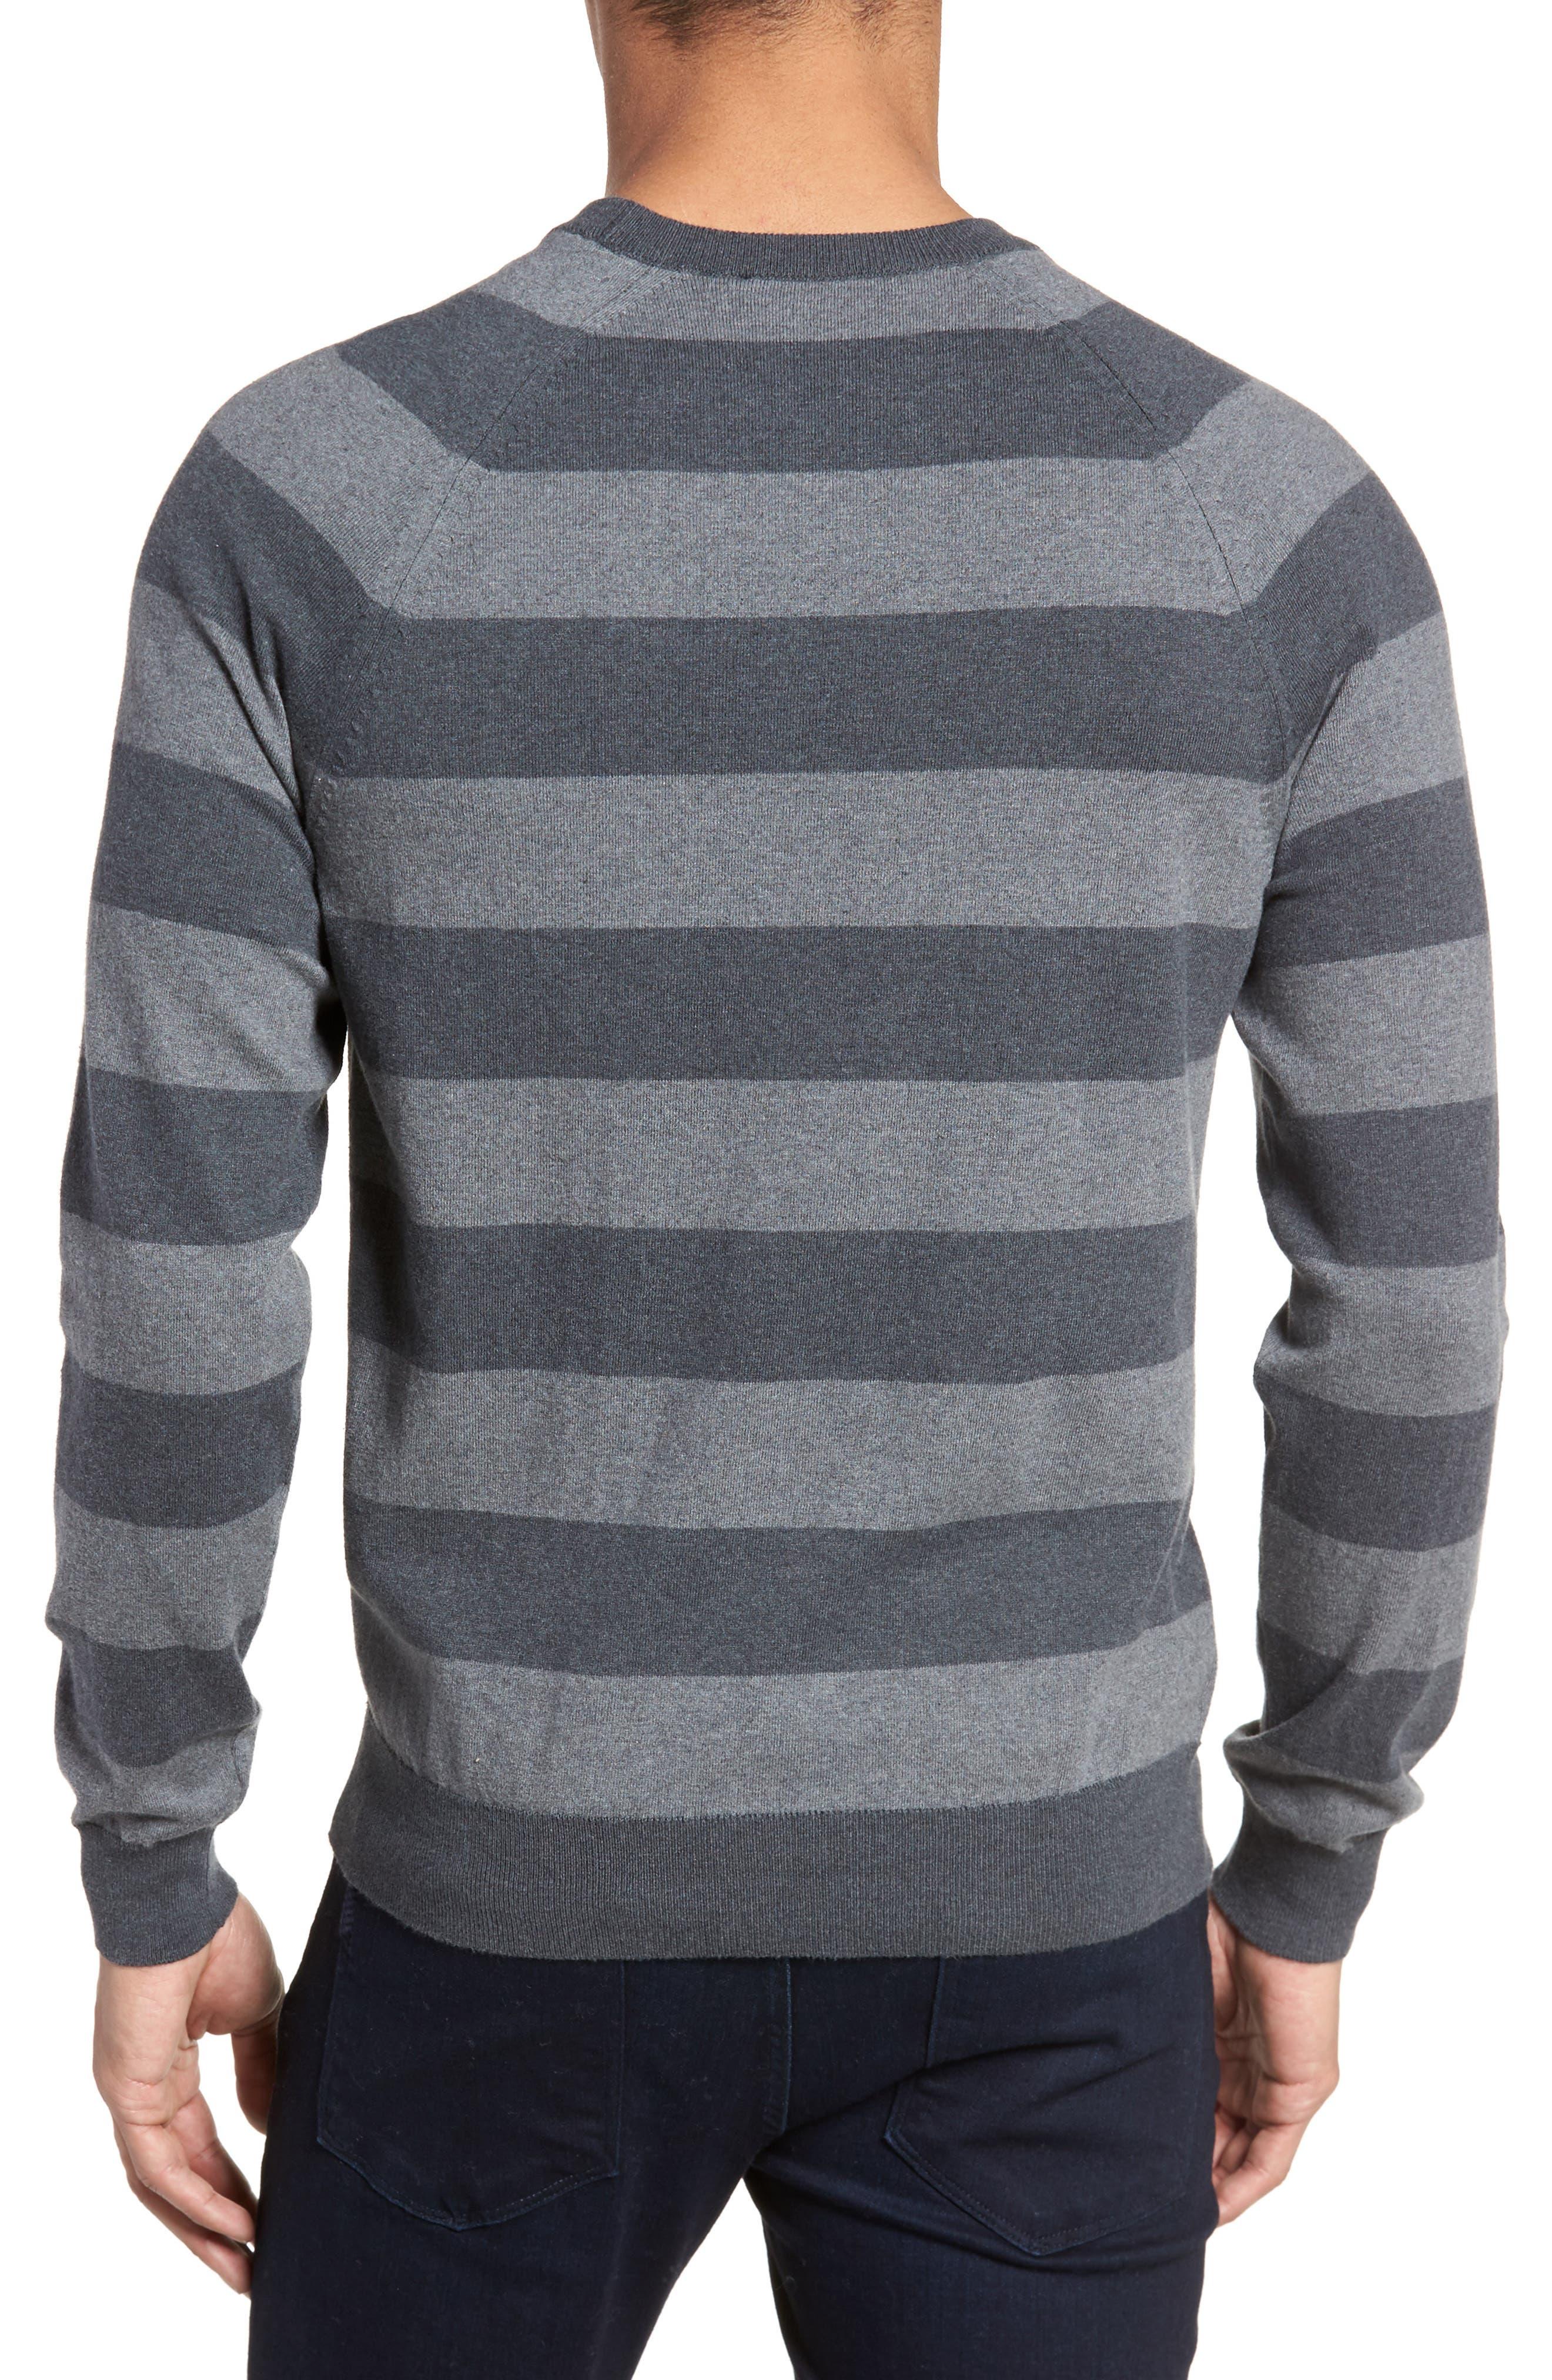 Stripe Stretch Cotton Sweater,                             Alternate thumbnail 2, color,                             Mid Grey/ Charcoal Melange